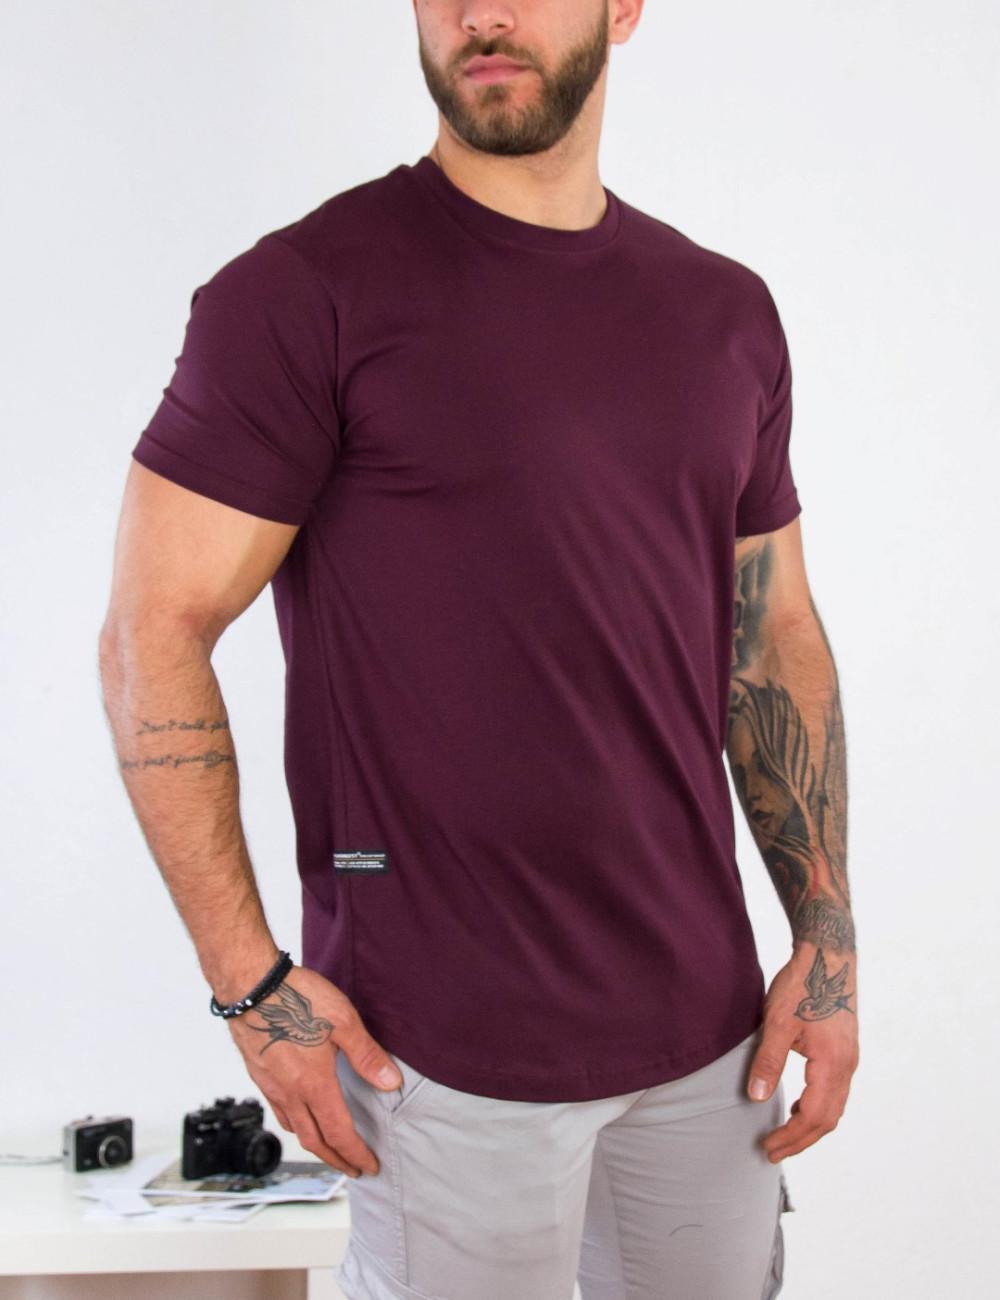 Everbest ανδρικό μπορντό βαμβακερό T-shirt 212905C